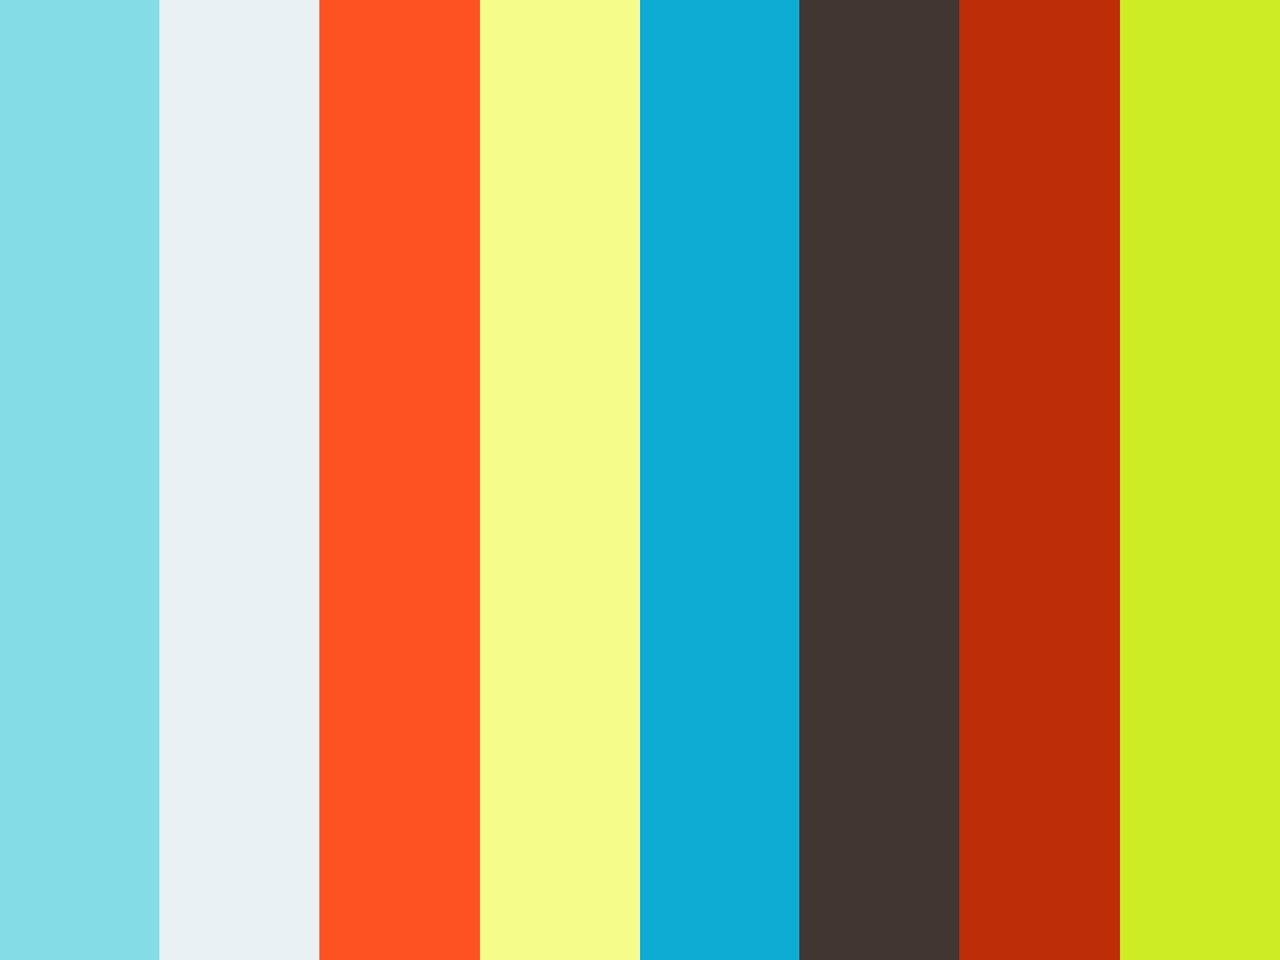 colorsynth reel 2K15